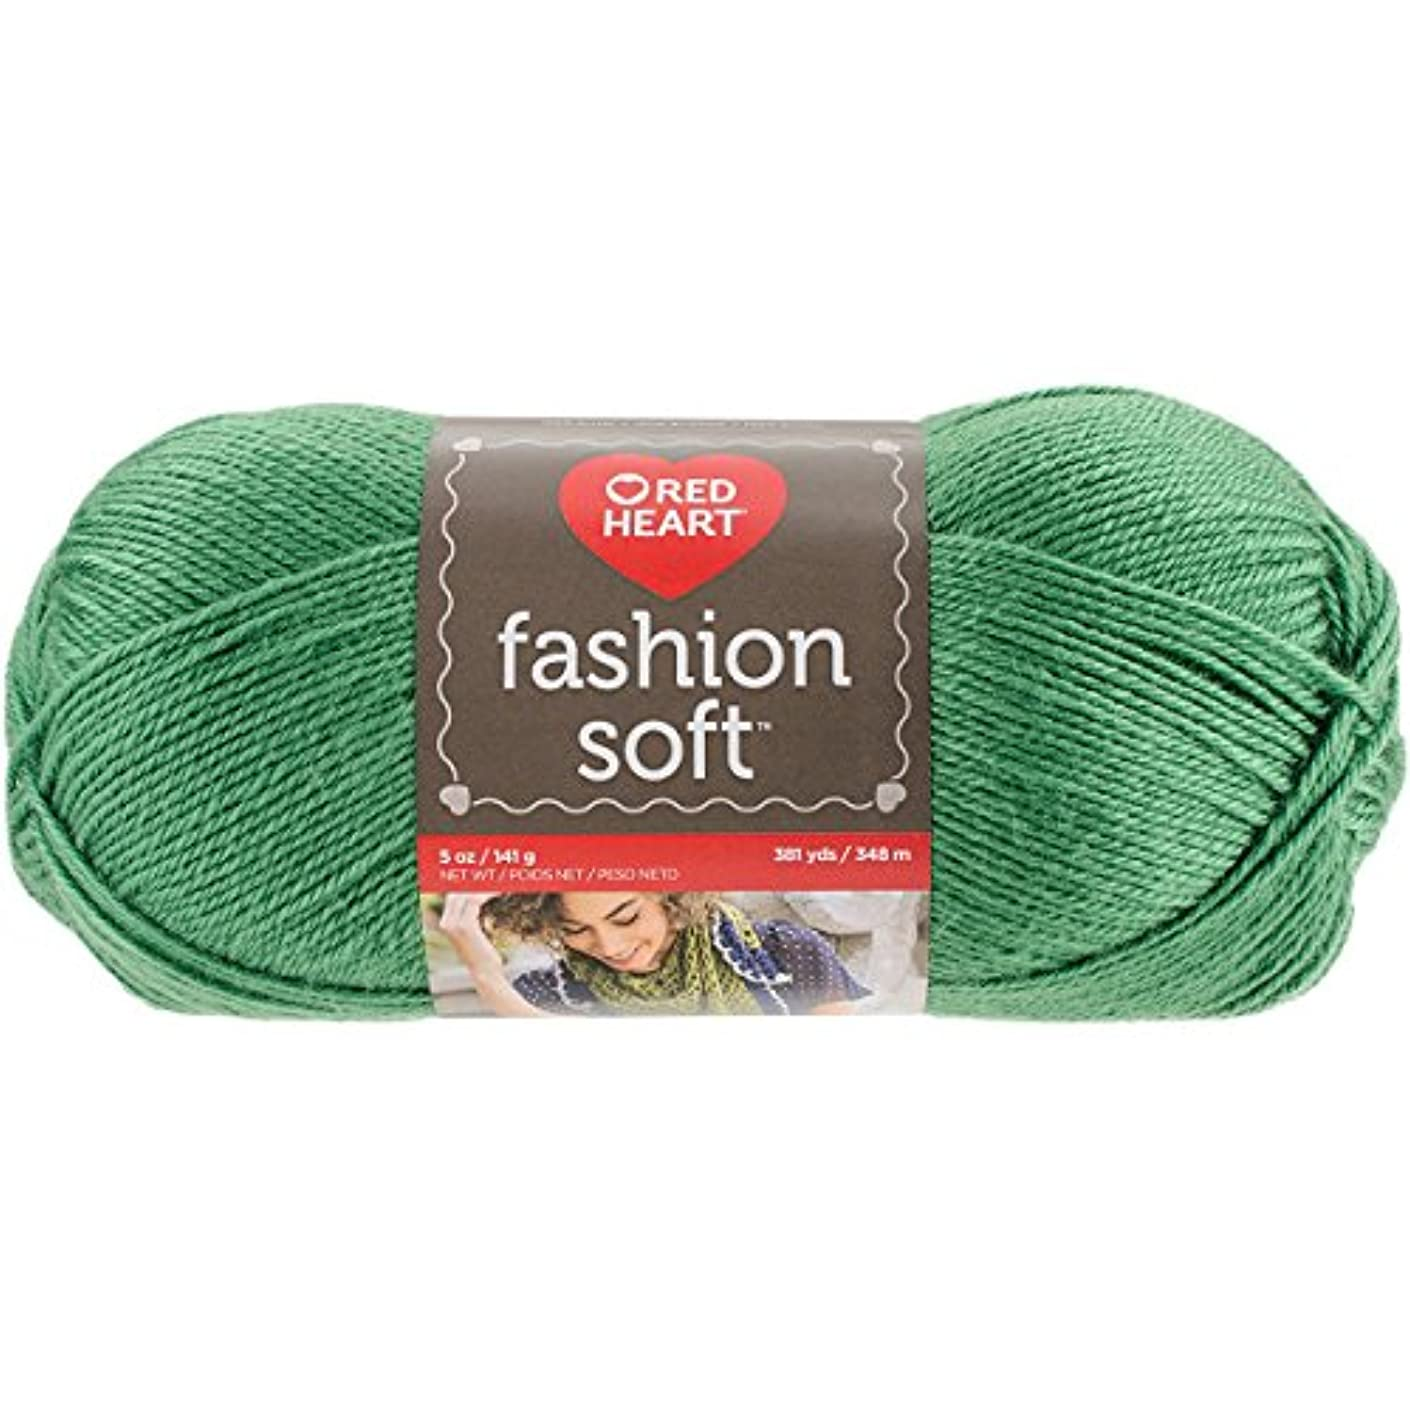 Coats Yarn E845.4652 Fashion Soft, Kelly Green